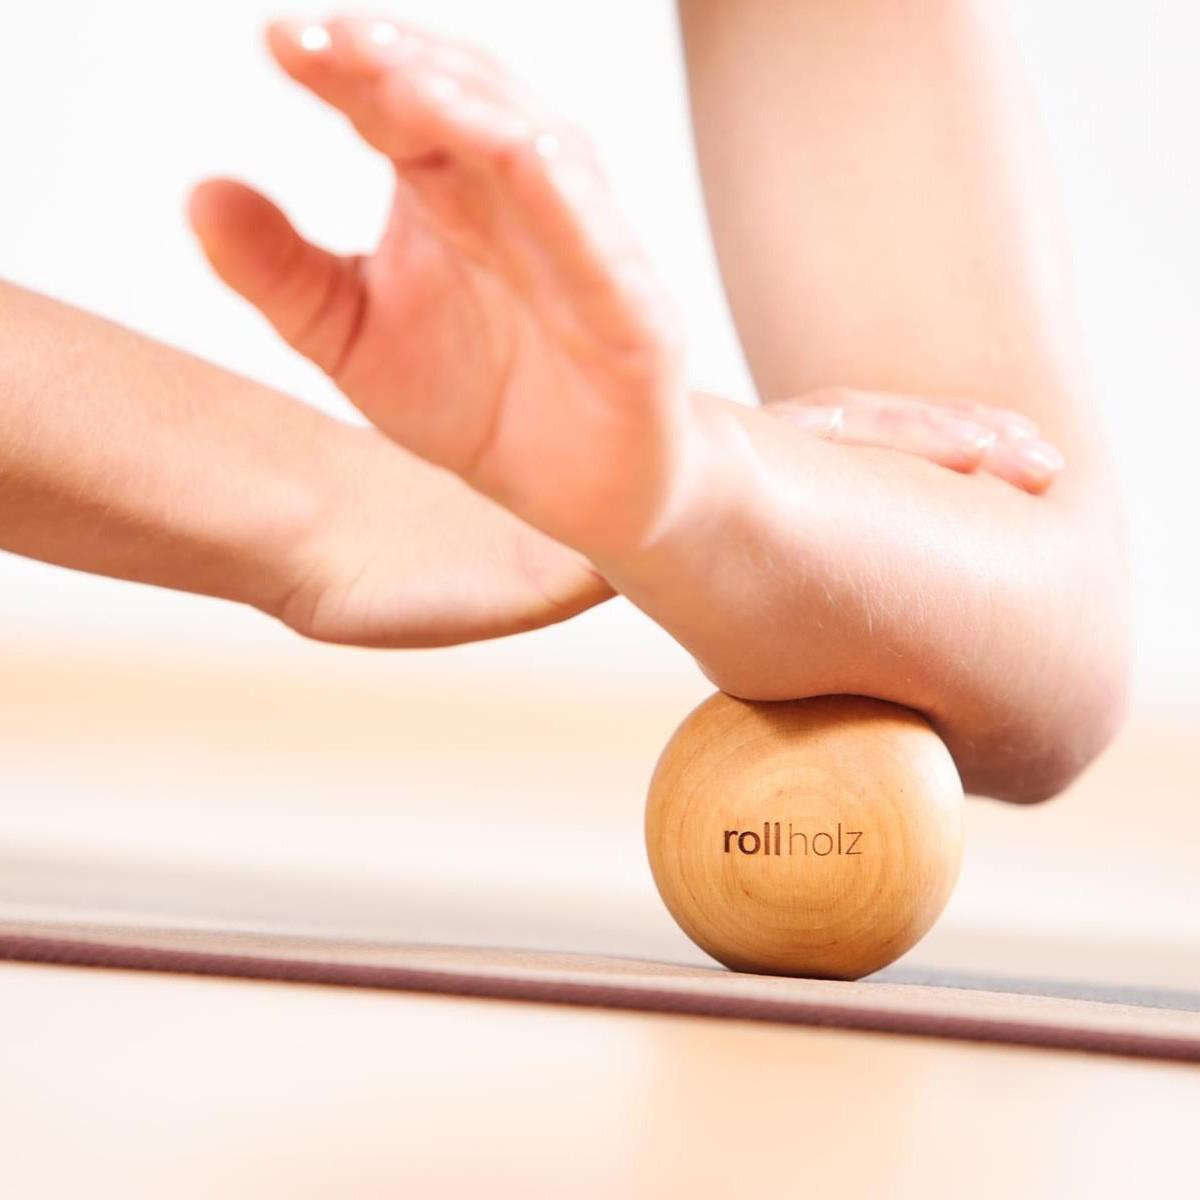 rollholz – Massagekugel aus Holz für punktuelle Behandlung – 7cm